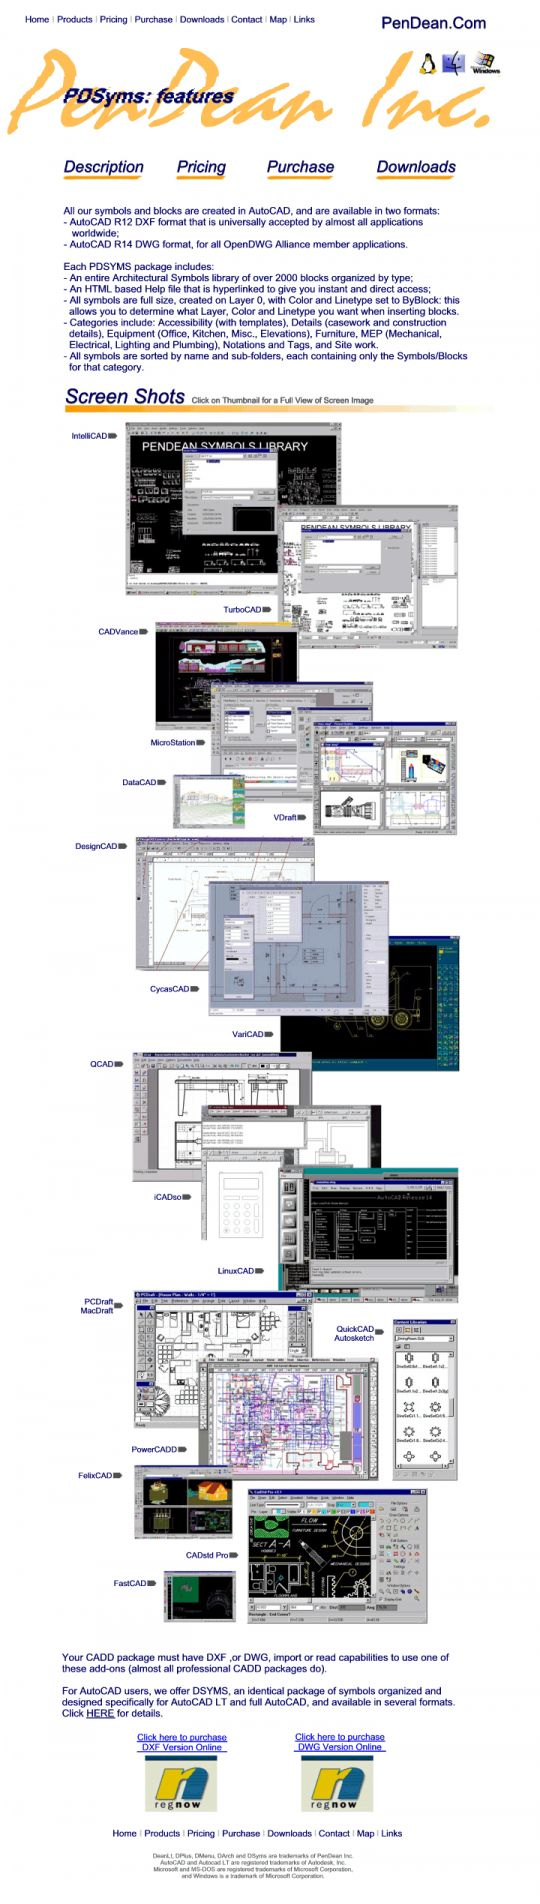 PDSYMS DWG Symbols Library Screenshot